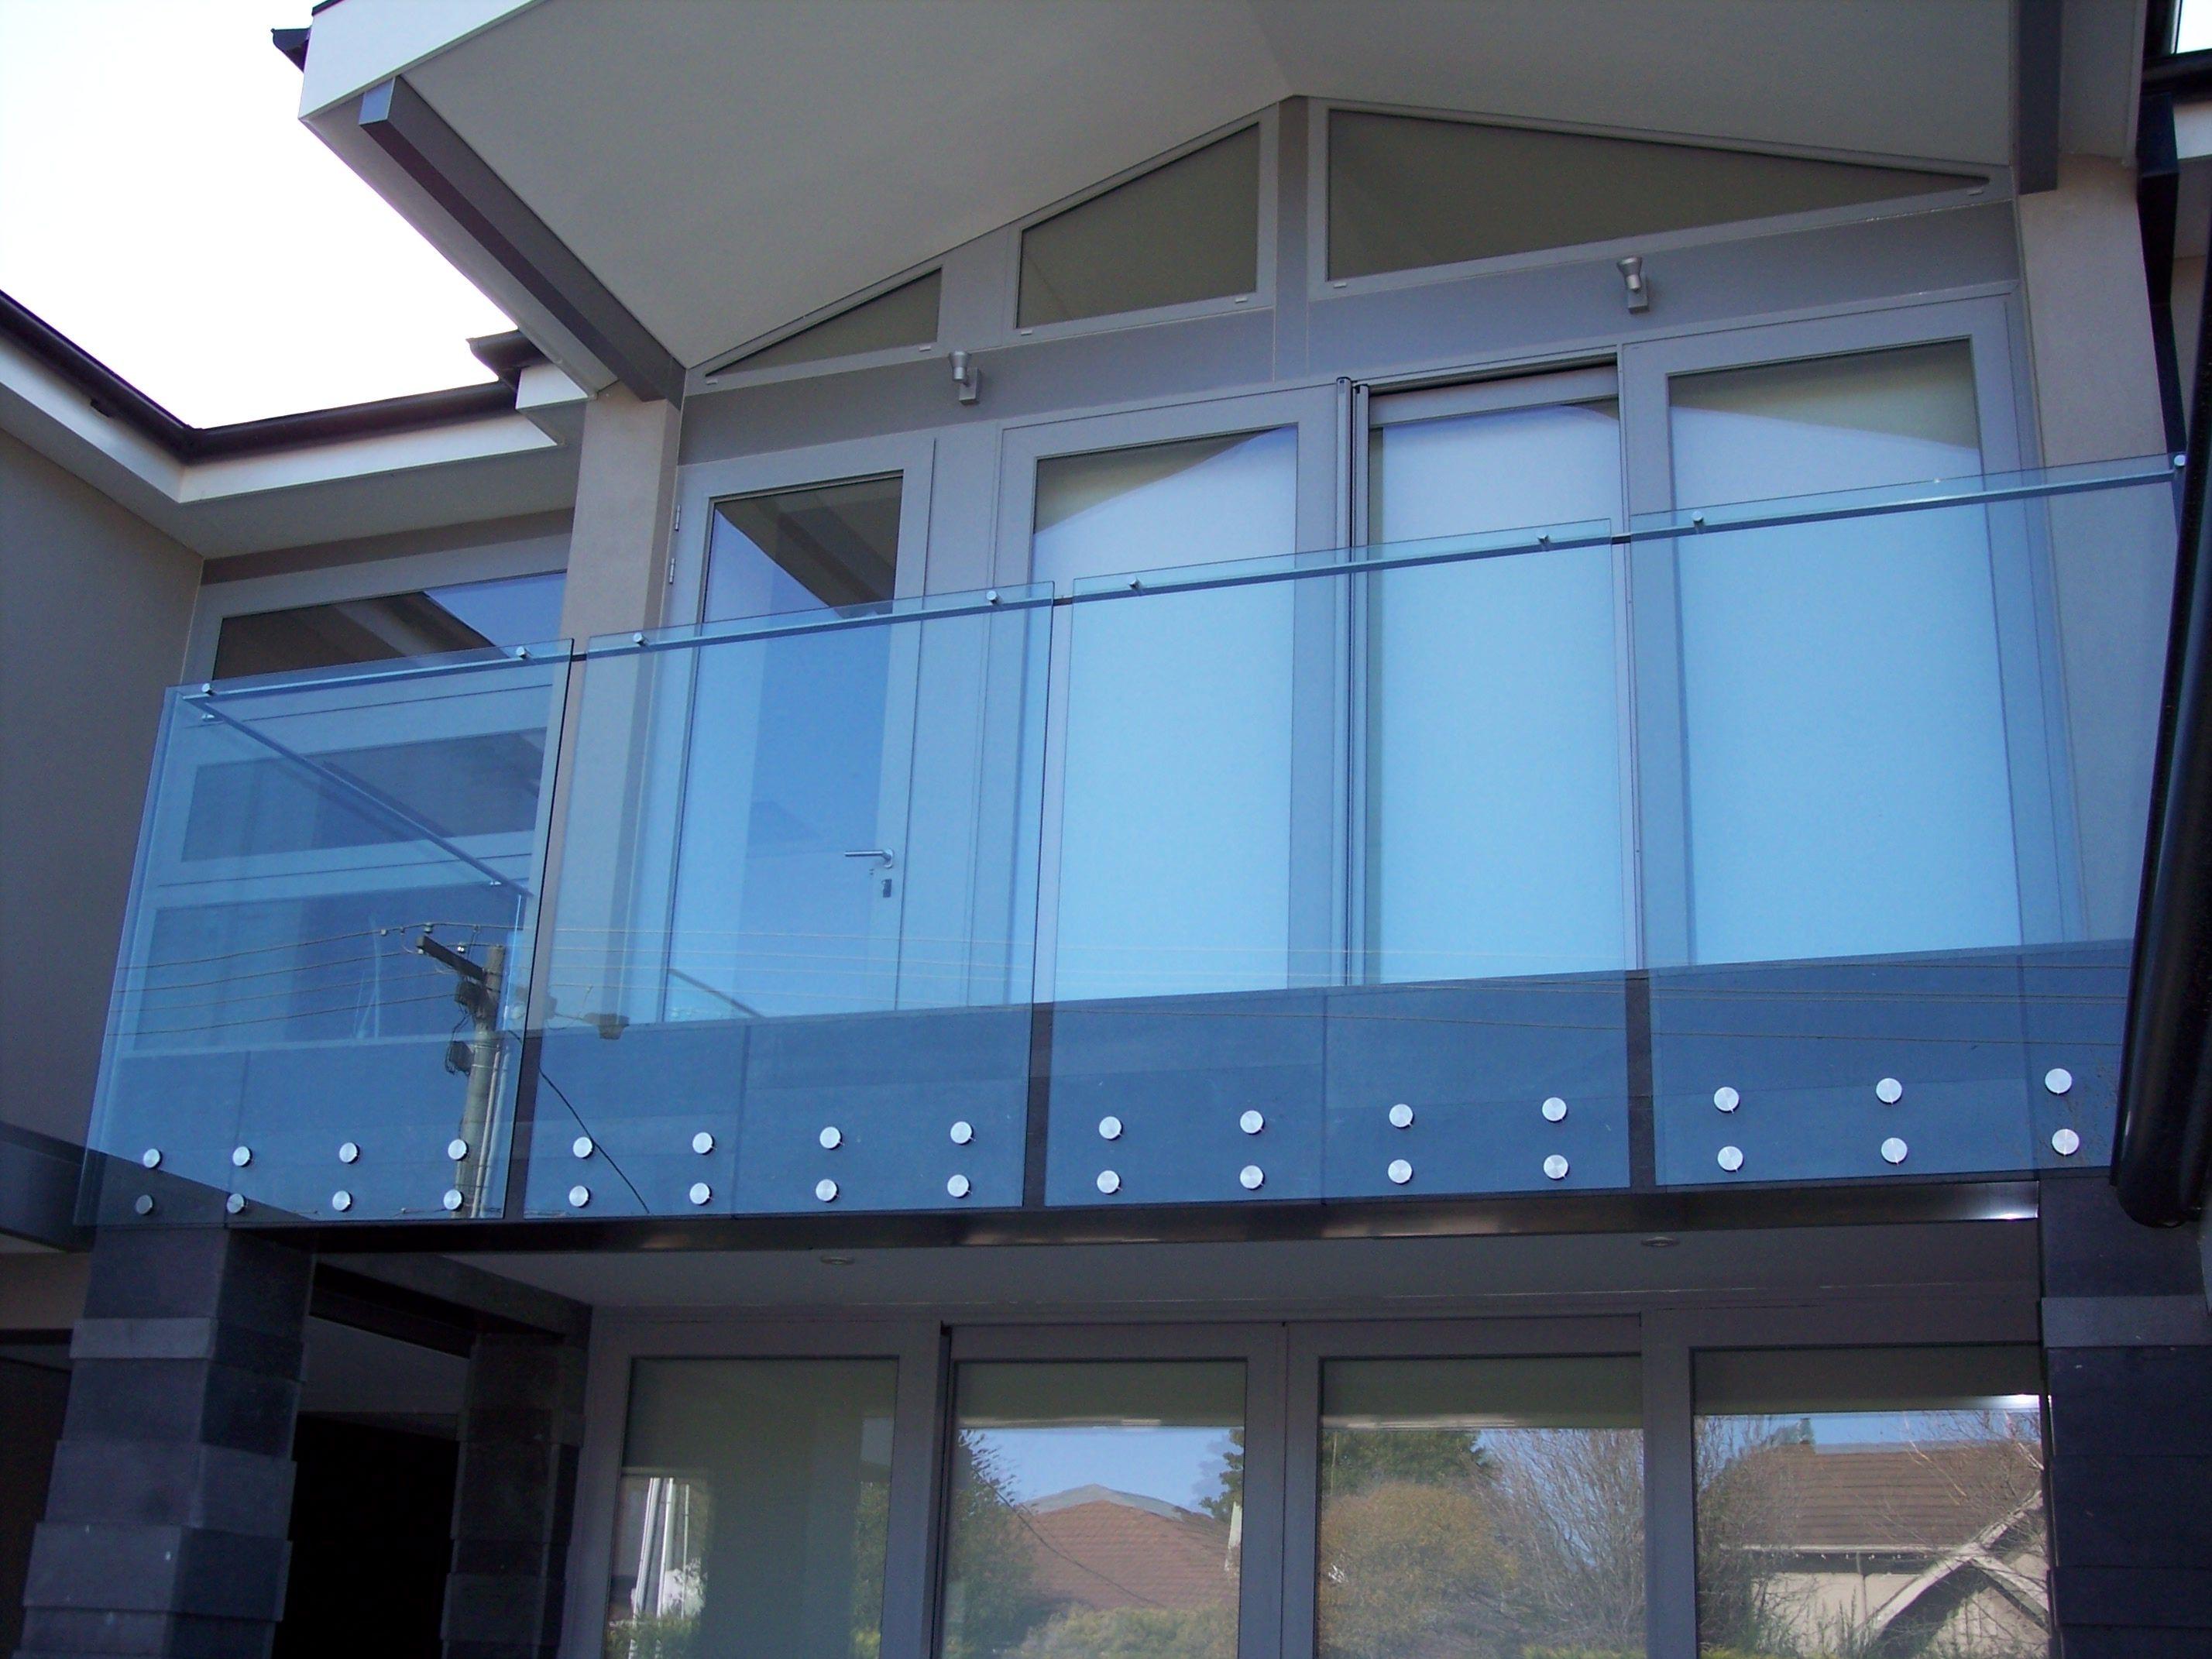 SimplyFrameless Exterior Bolt Fixed Balustrade with Handrail